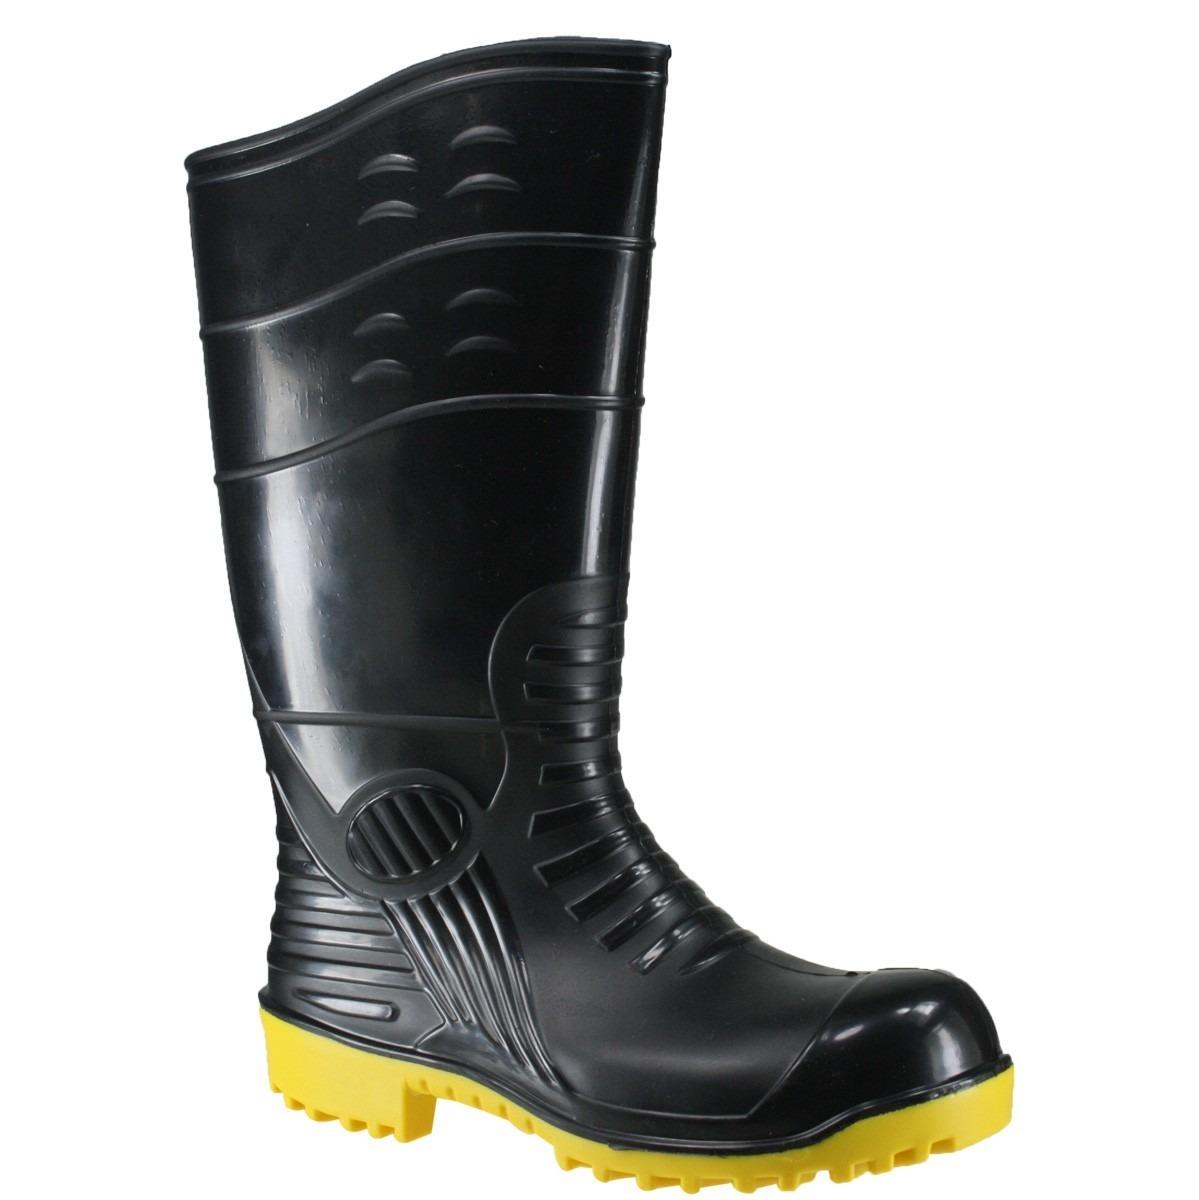 c18c250aa77 bota coturno galocha motoqueiro moto impermeavel chuva 40128. Carregando  zoom.